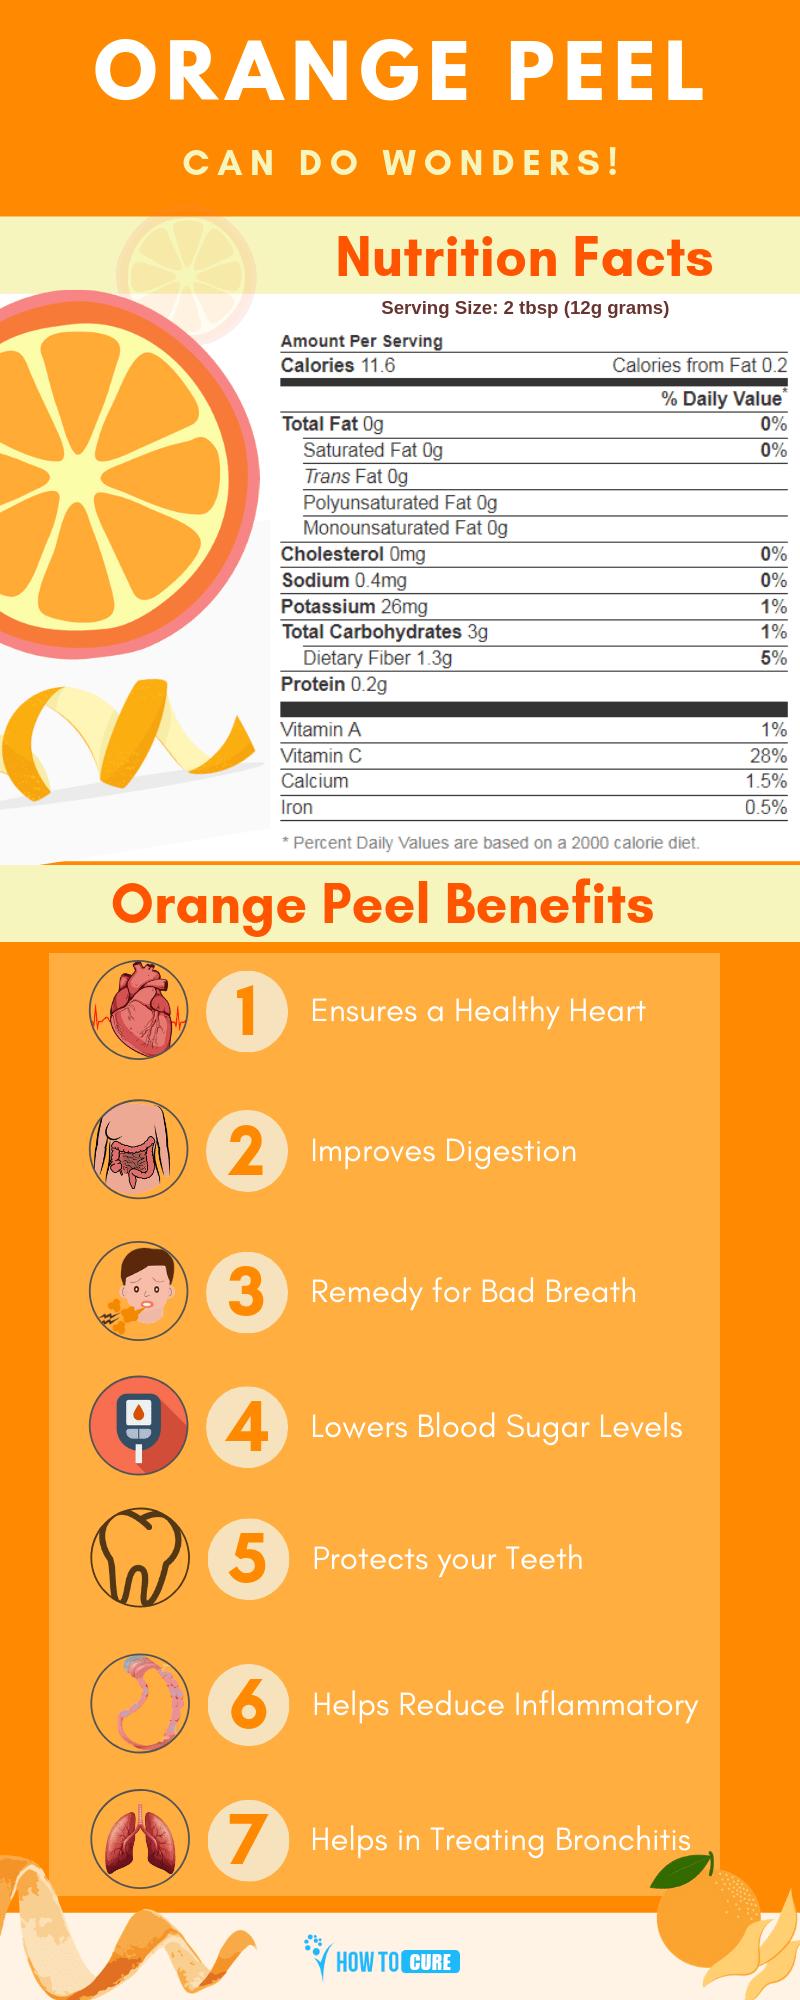 Orange Roughy Health Benefits